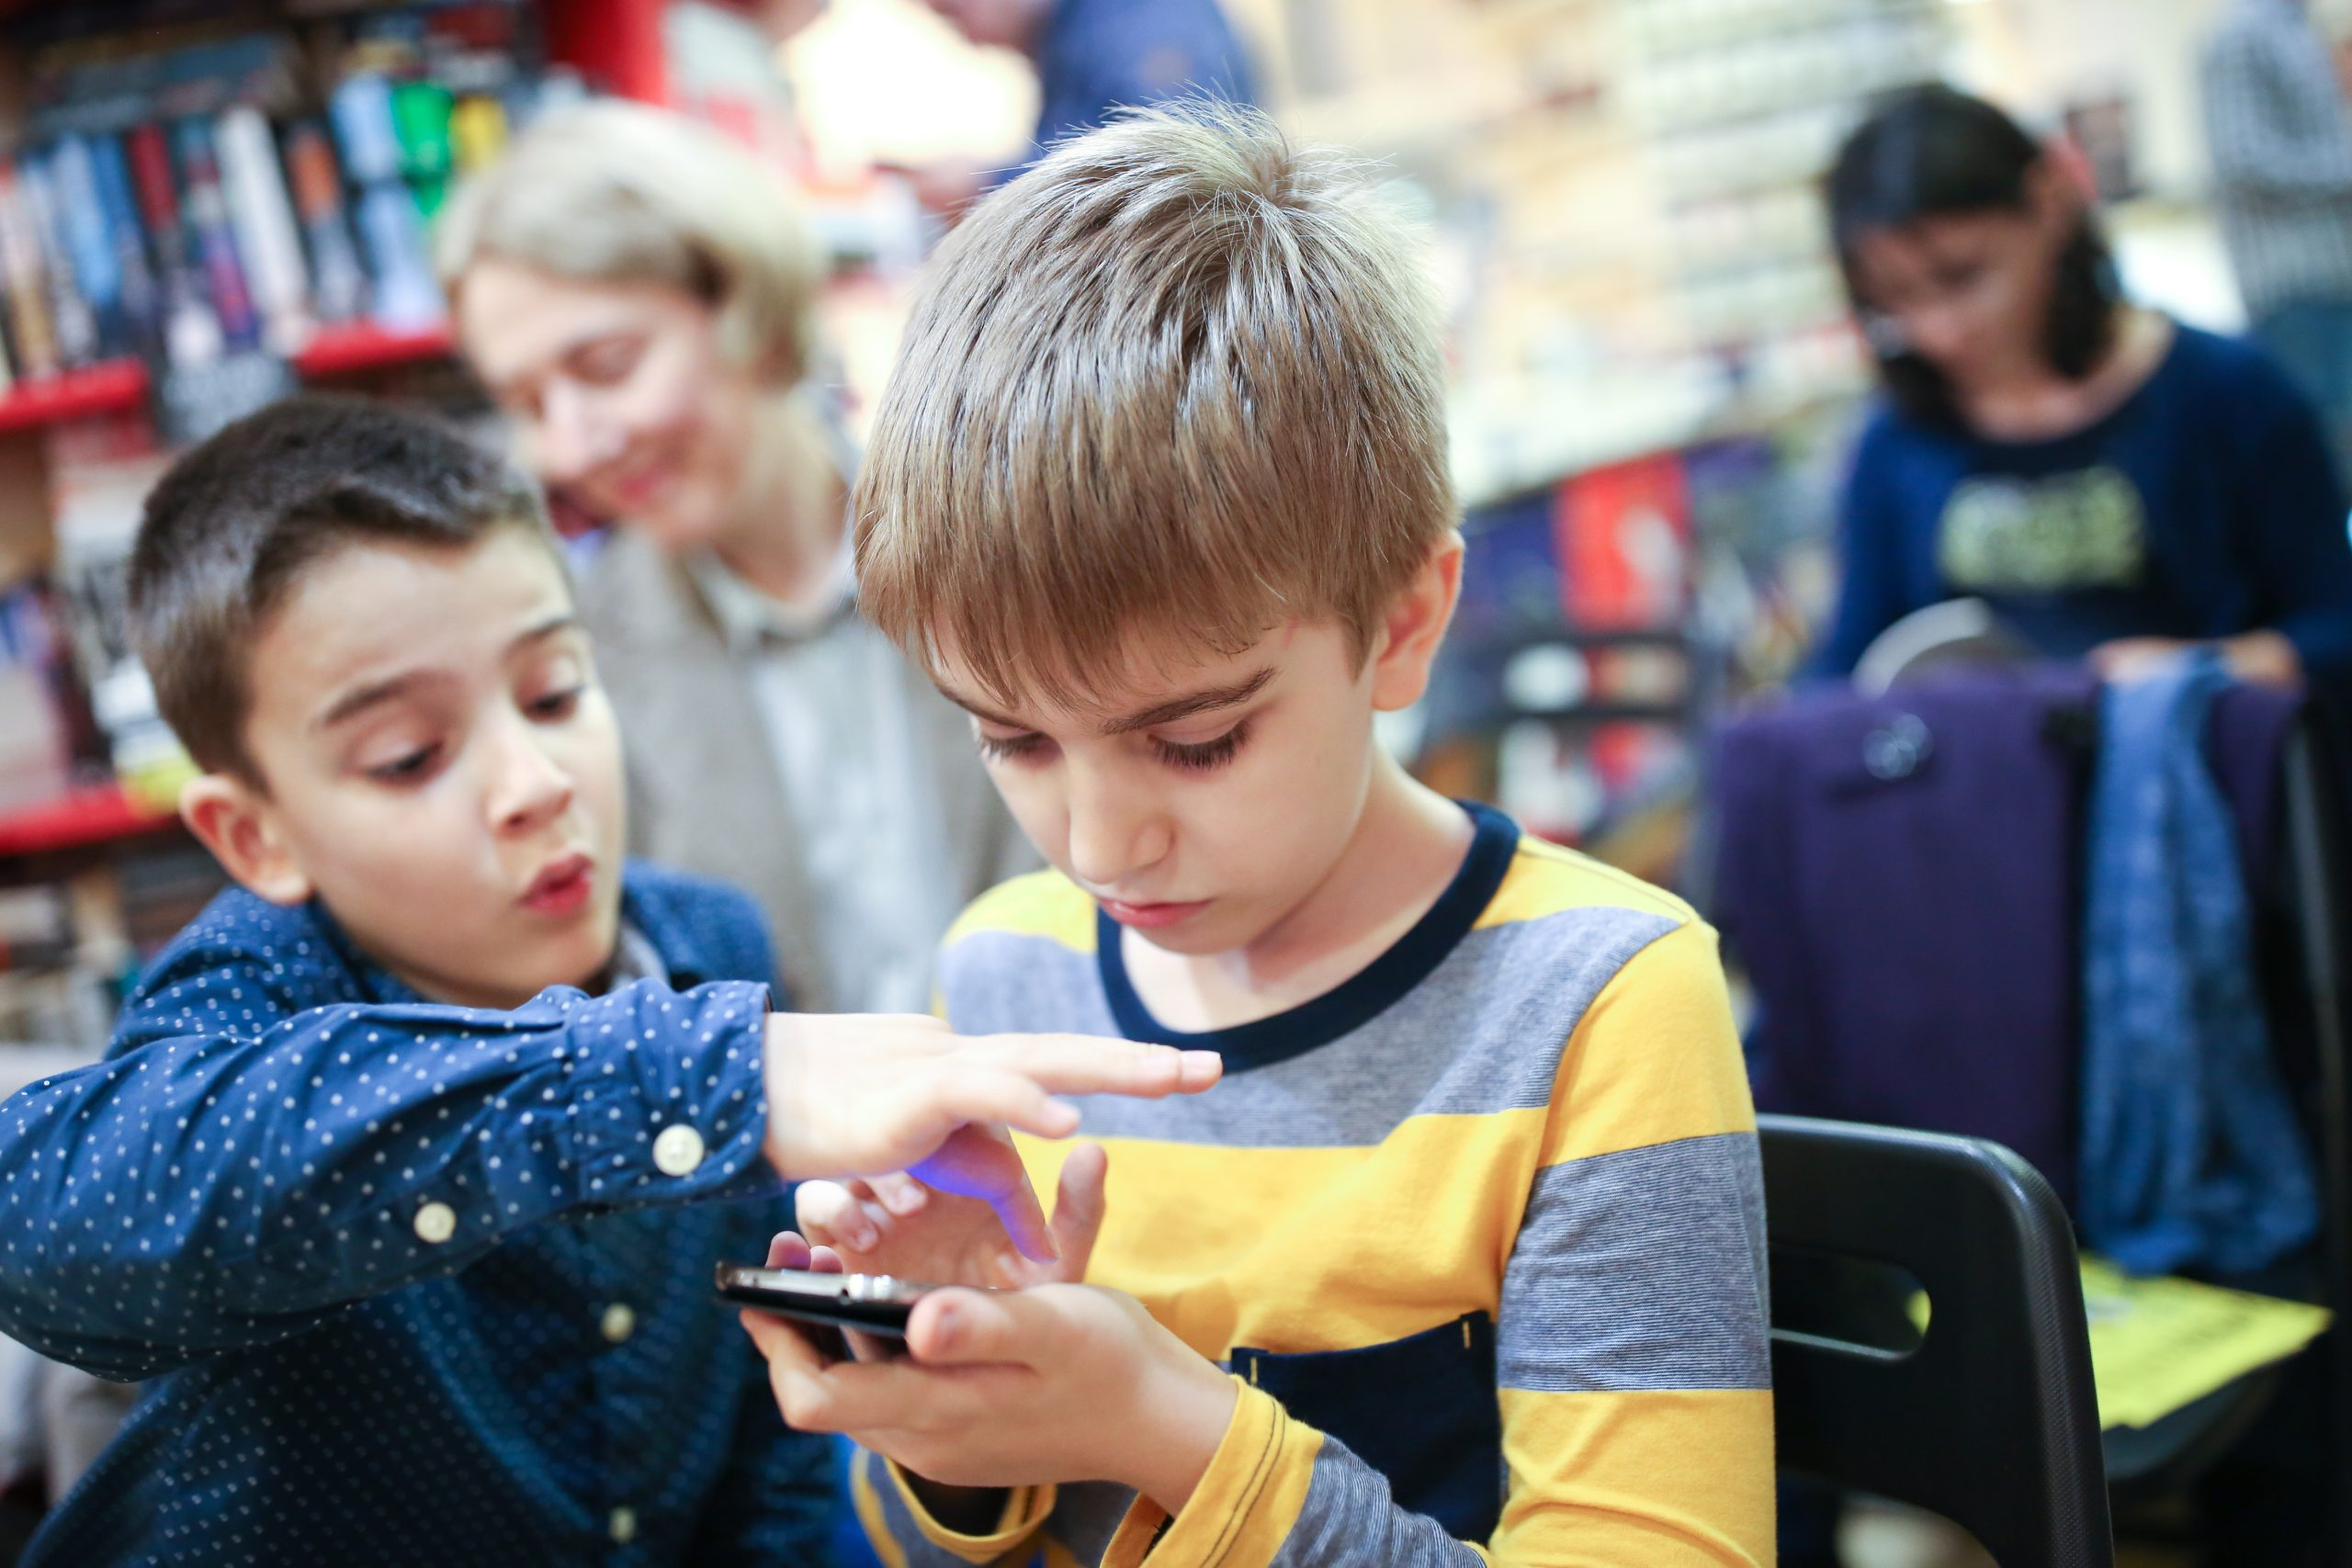 Nativii digital cresc la tine in casa. Ce stii despre ei? #borndigital 1